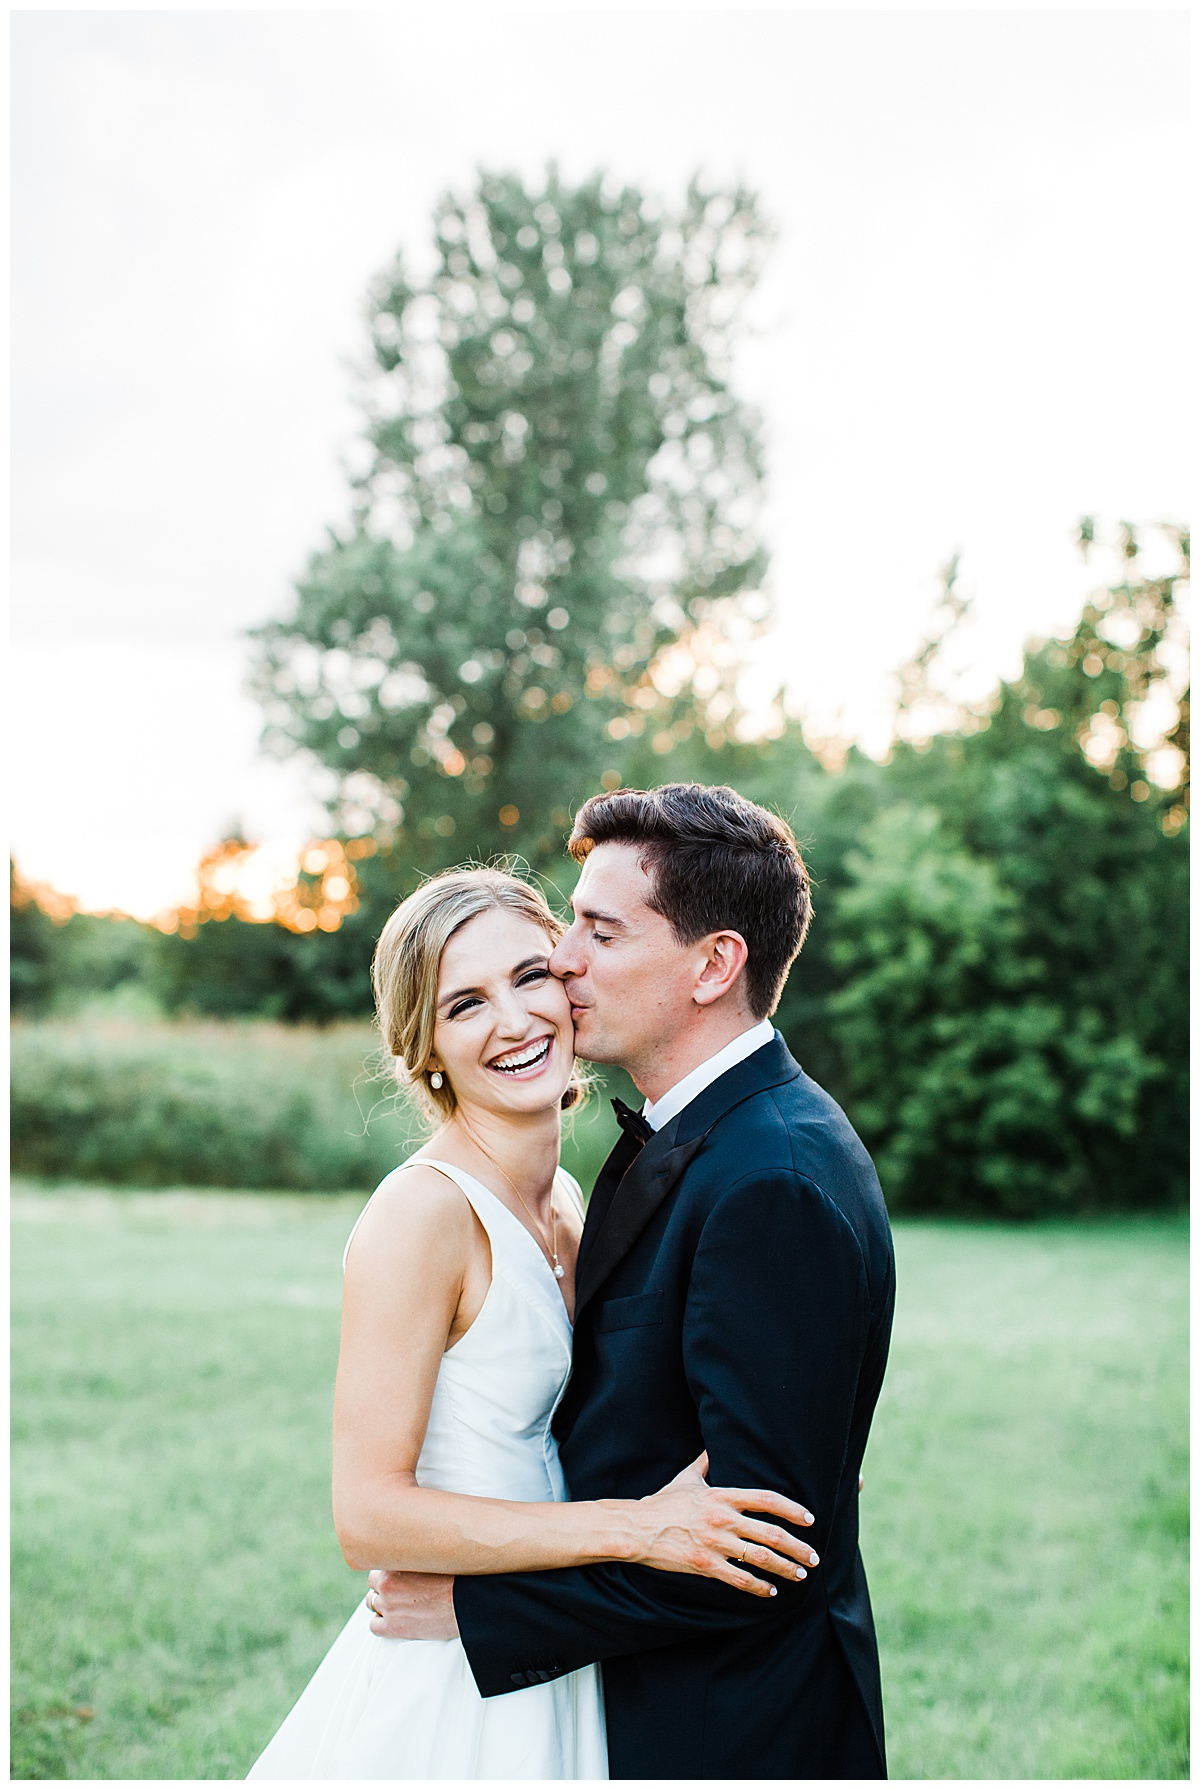 Groom kisses bride on cheek while she laughs  Georgetown, Ontario wedding photographer  Toronto wedding photographer  3photography